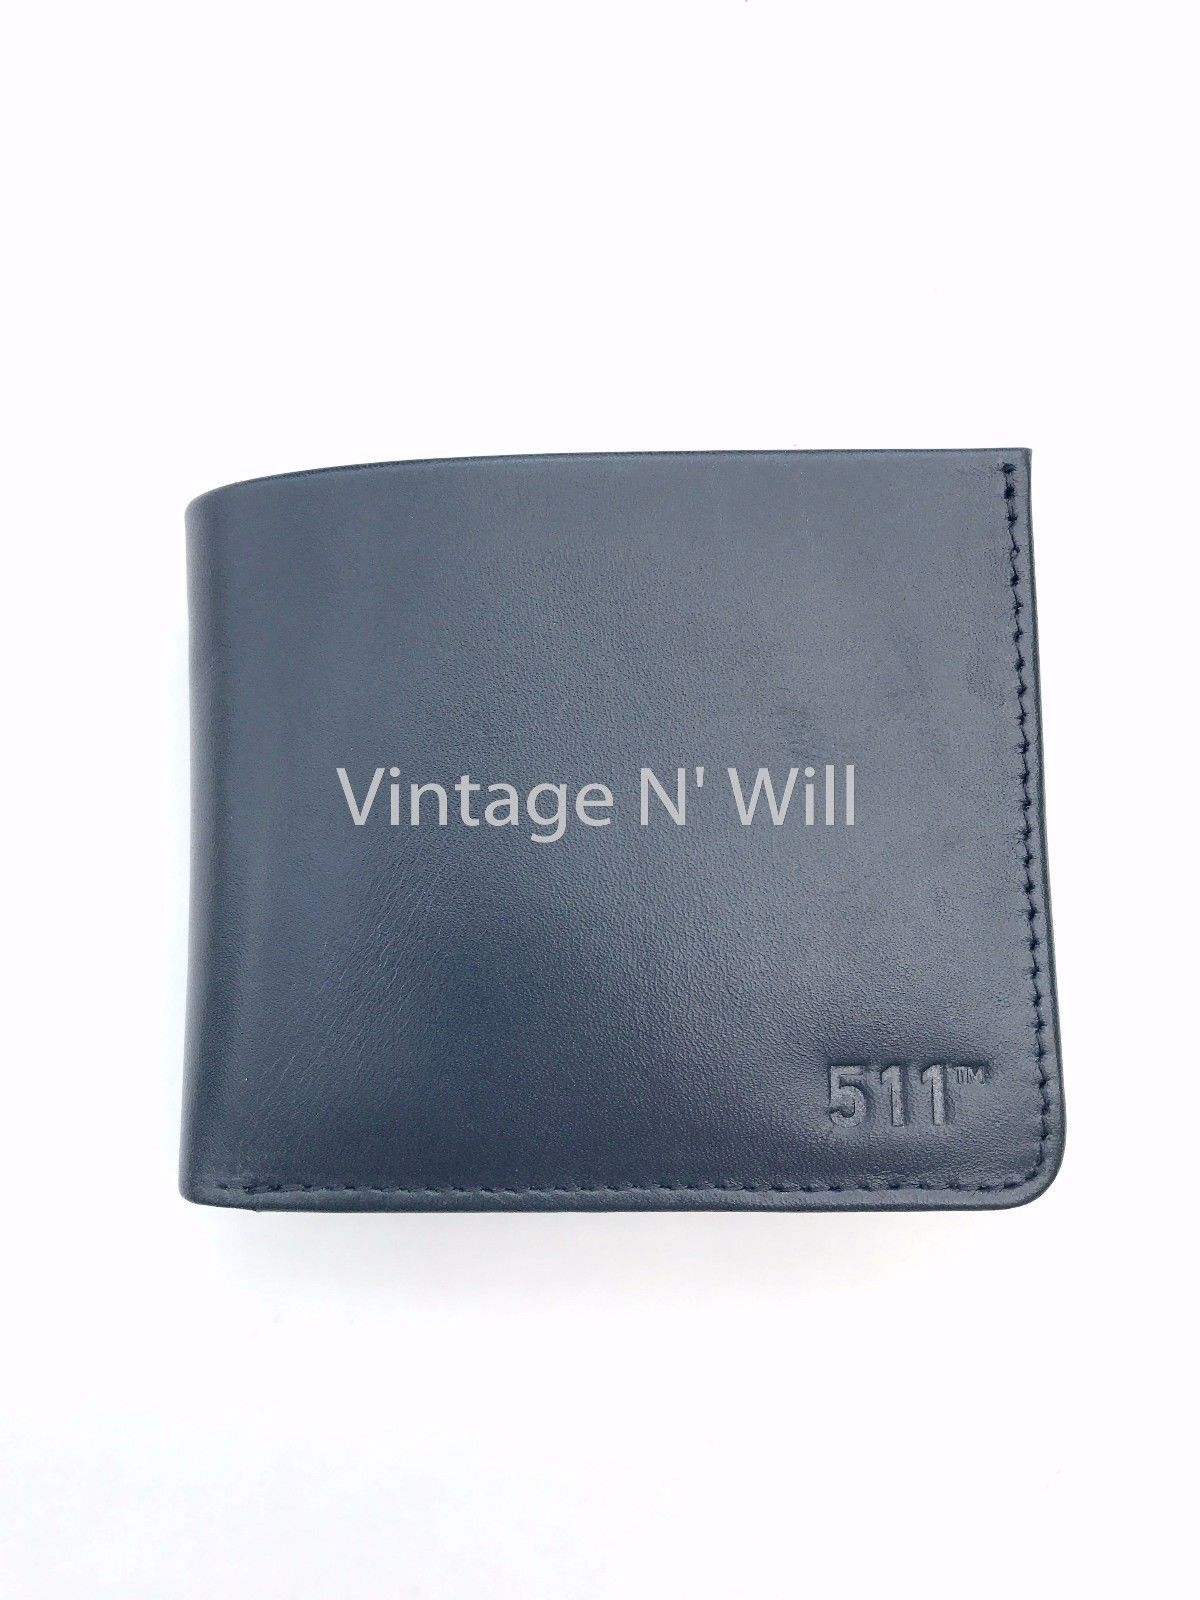 Levis Jeans Mens 511 Slim Navy Blue Genuine Leather Wallet Billfold Bifold Card image 2